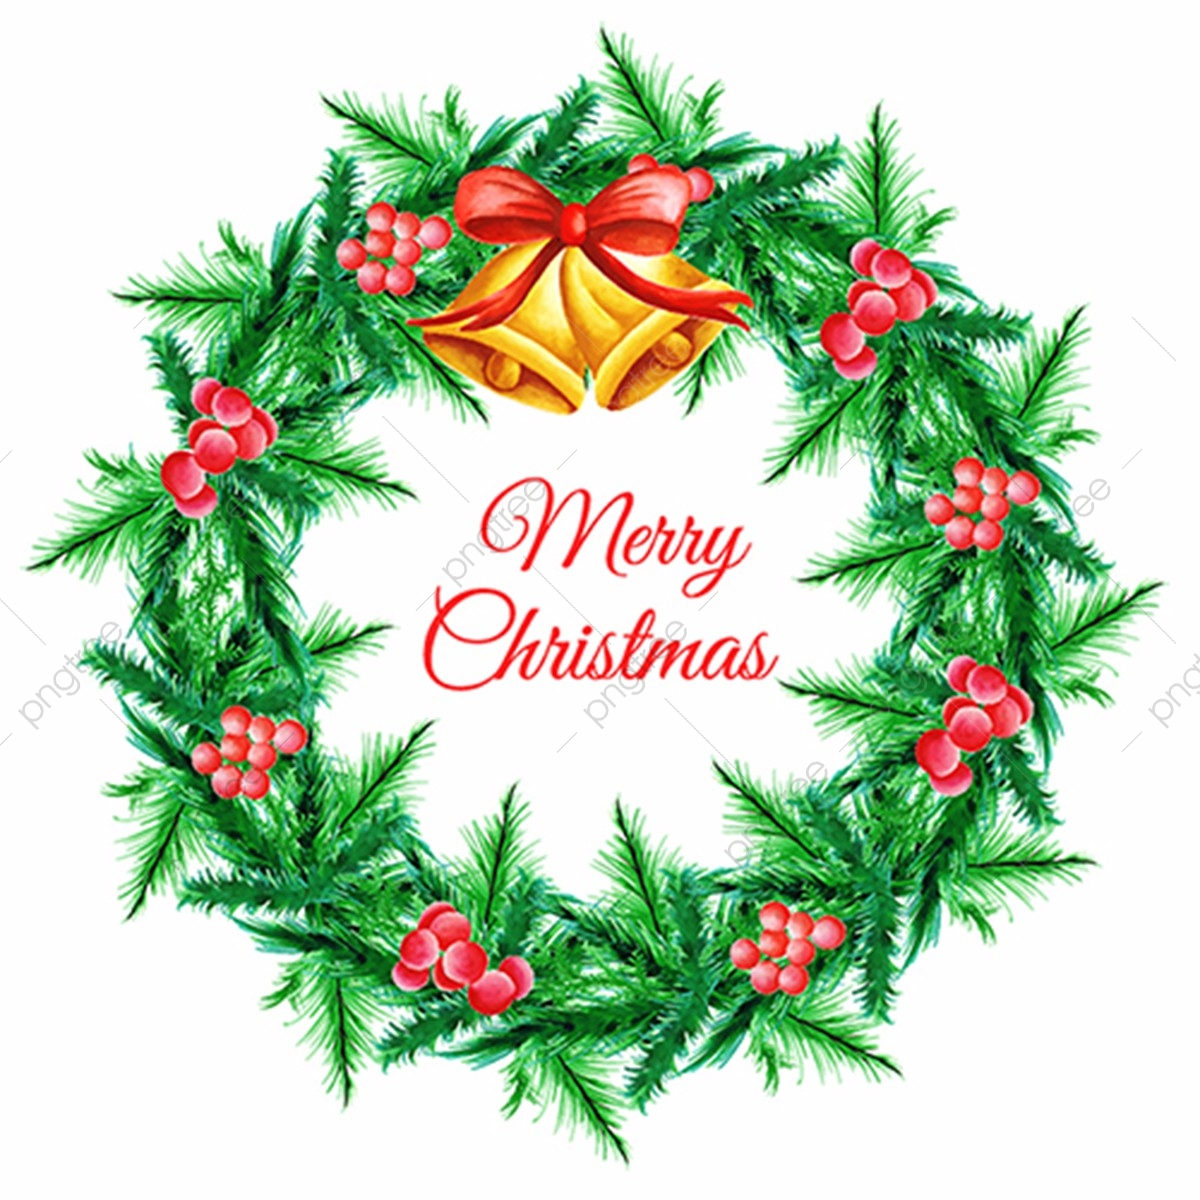 Watercolor Christmas Wreath Png.Watercolor Christmas Wreath Christmas Ornament Background